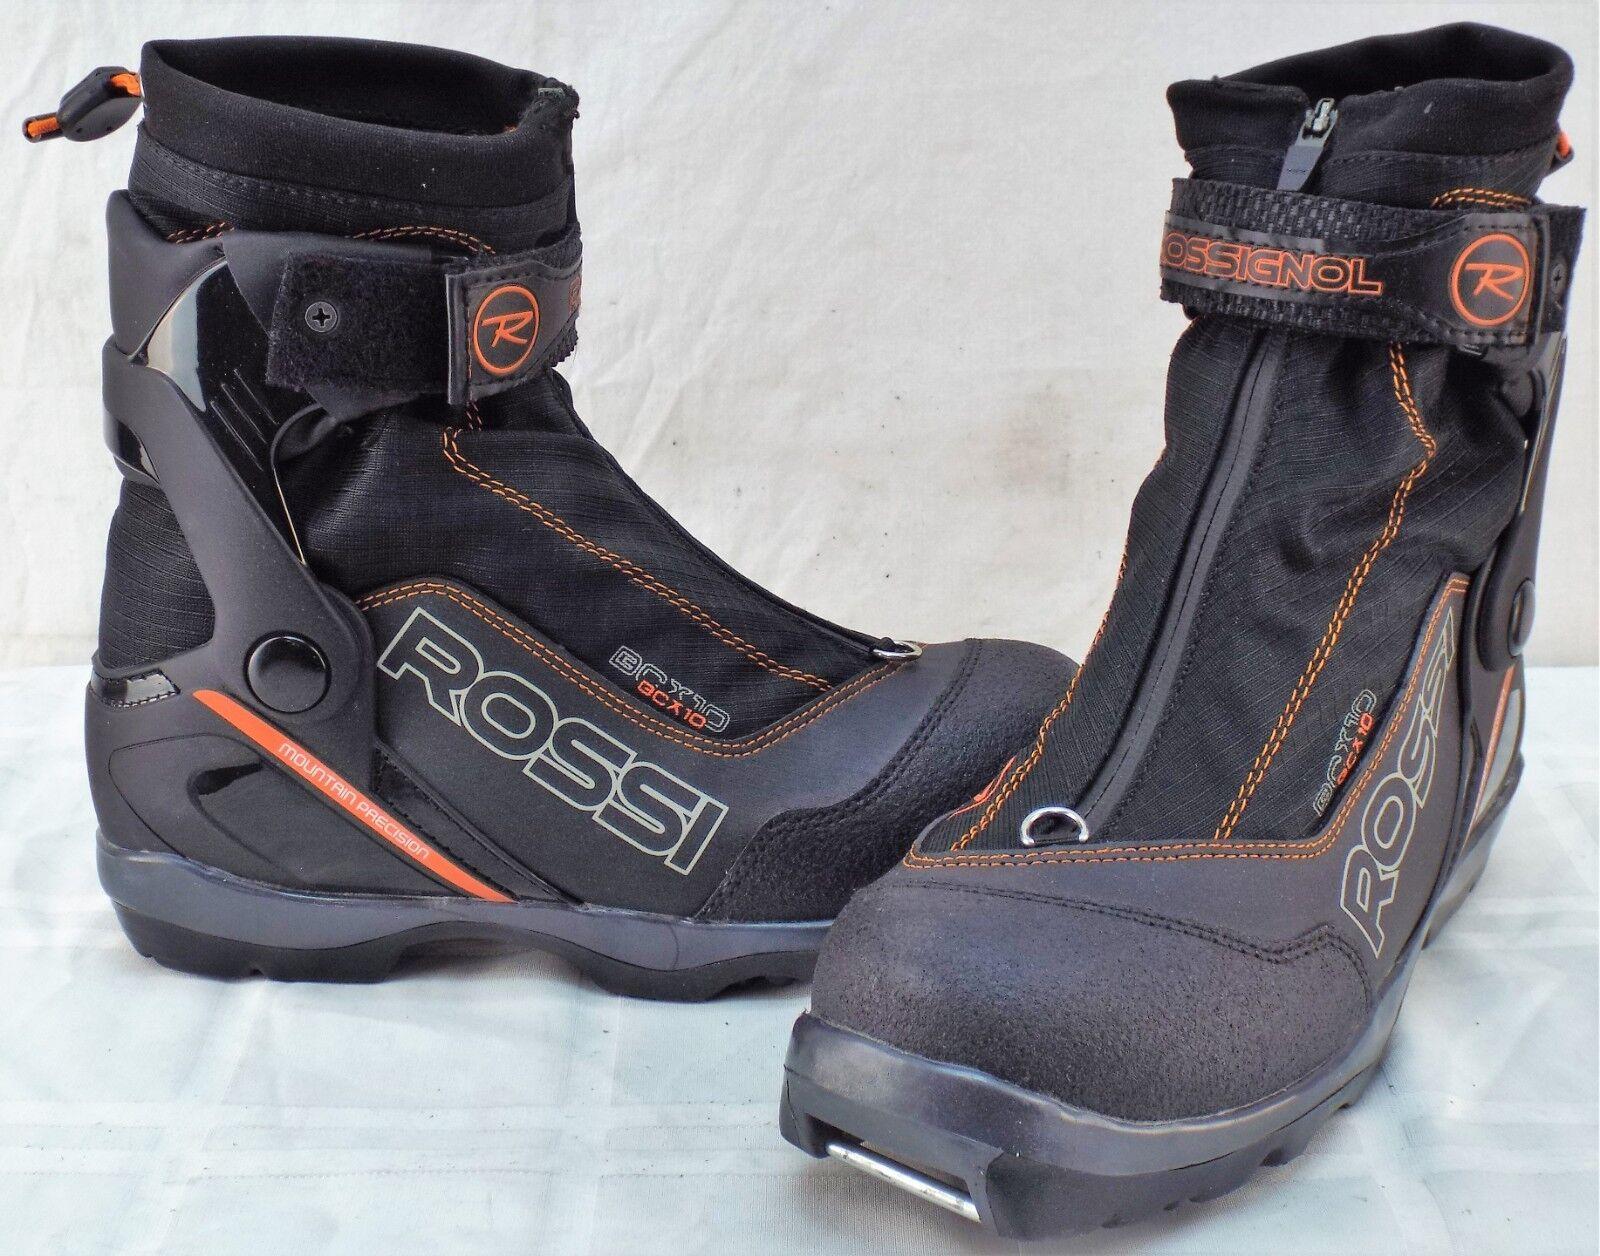 Rossignol BC X10 New Men's Cross Country Ski  Boots Size 41.0 Eu 8.5 US  100% genuine counter guarantee